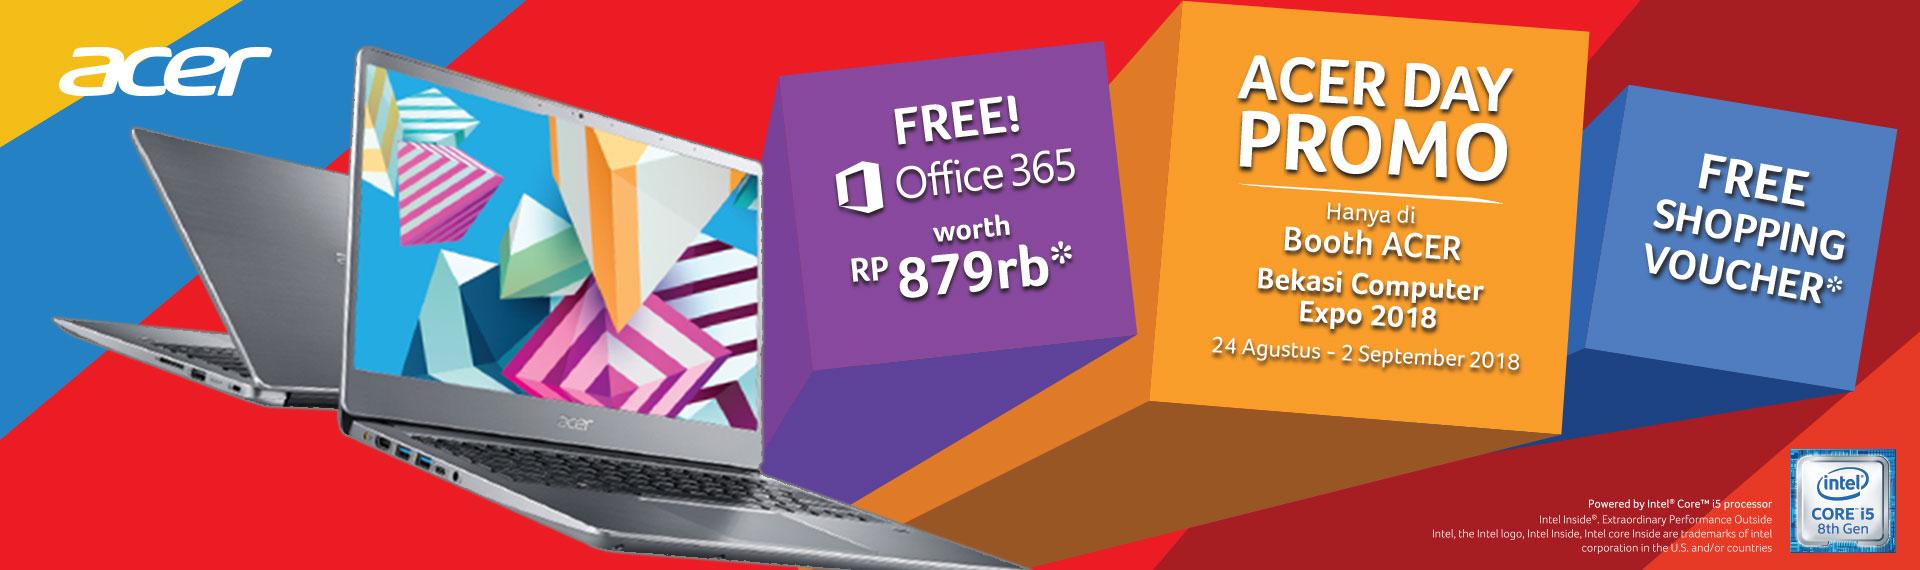 Acer Day Tebar Promo Produk di Bekasi Computer Expo!